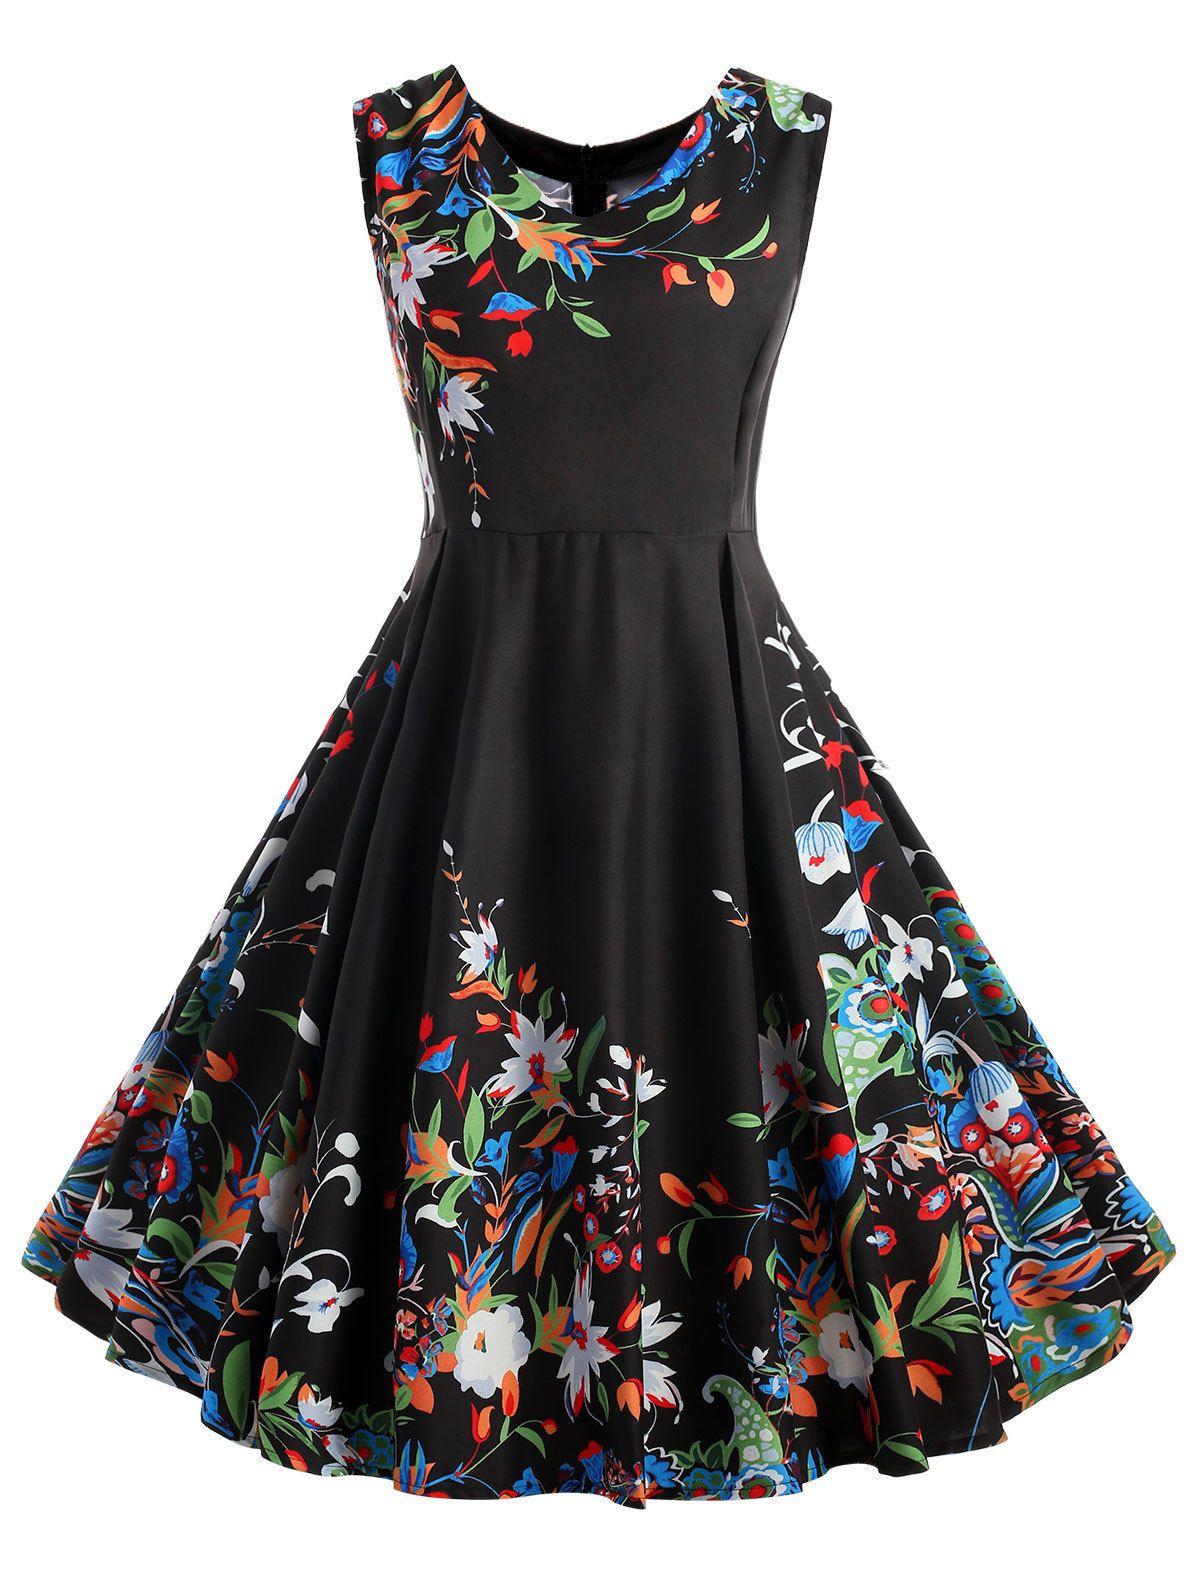 5d00ef5001c21 Adidas Plus Size Women S Workout Clothing. Dresses  ebay  Fashion